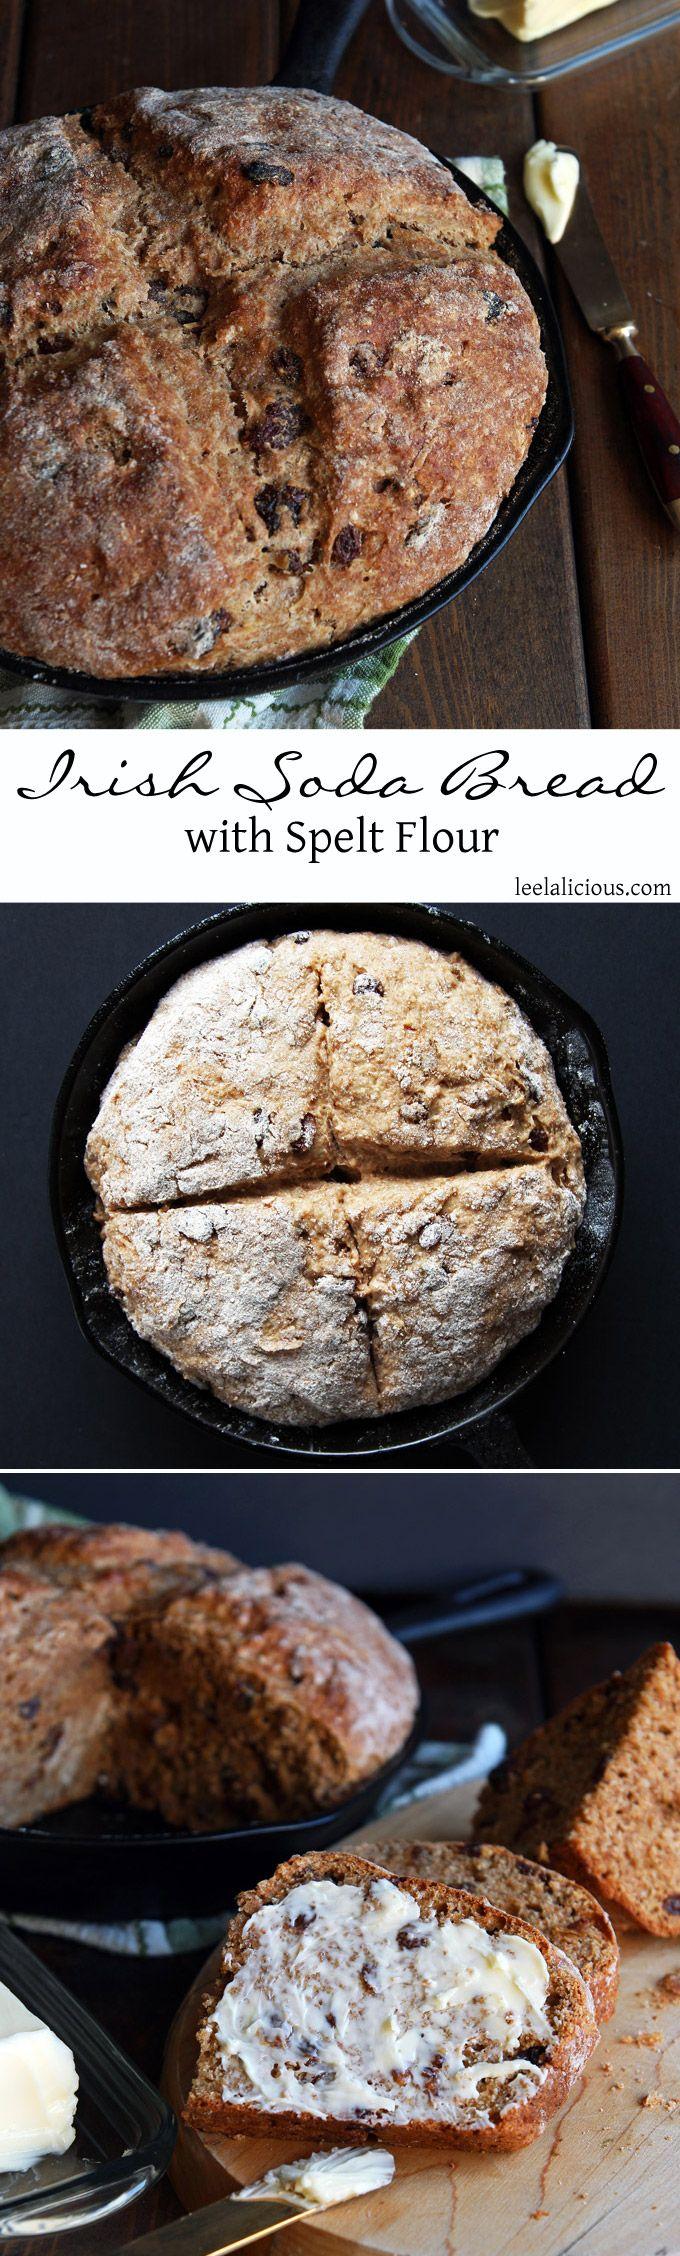 Irish Soda Bread made with Spelt Flour